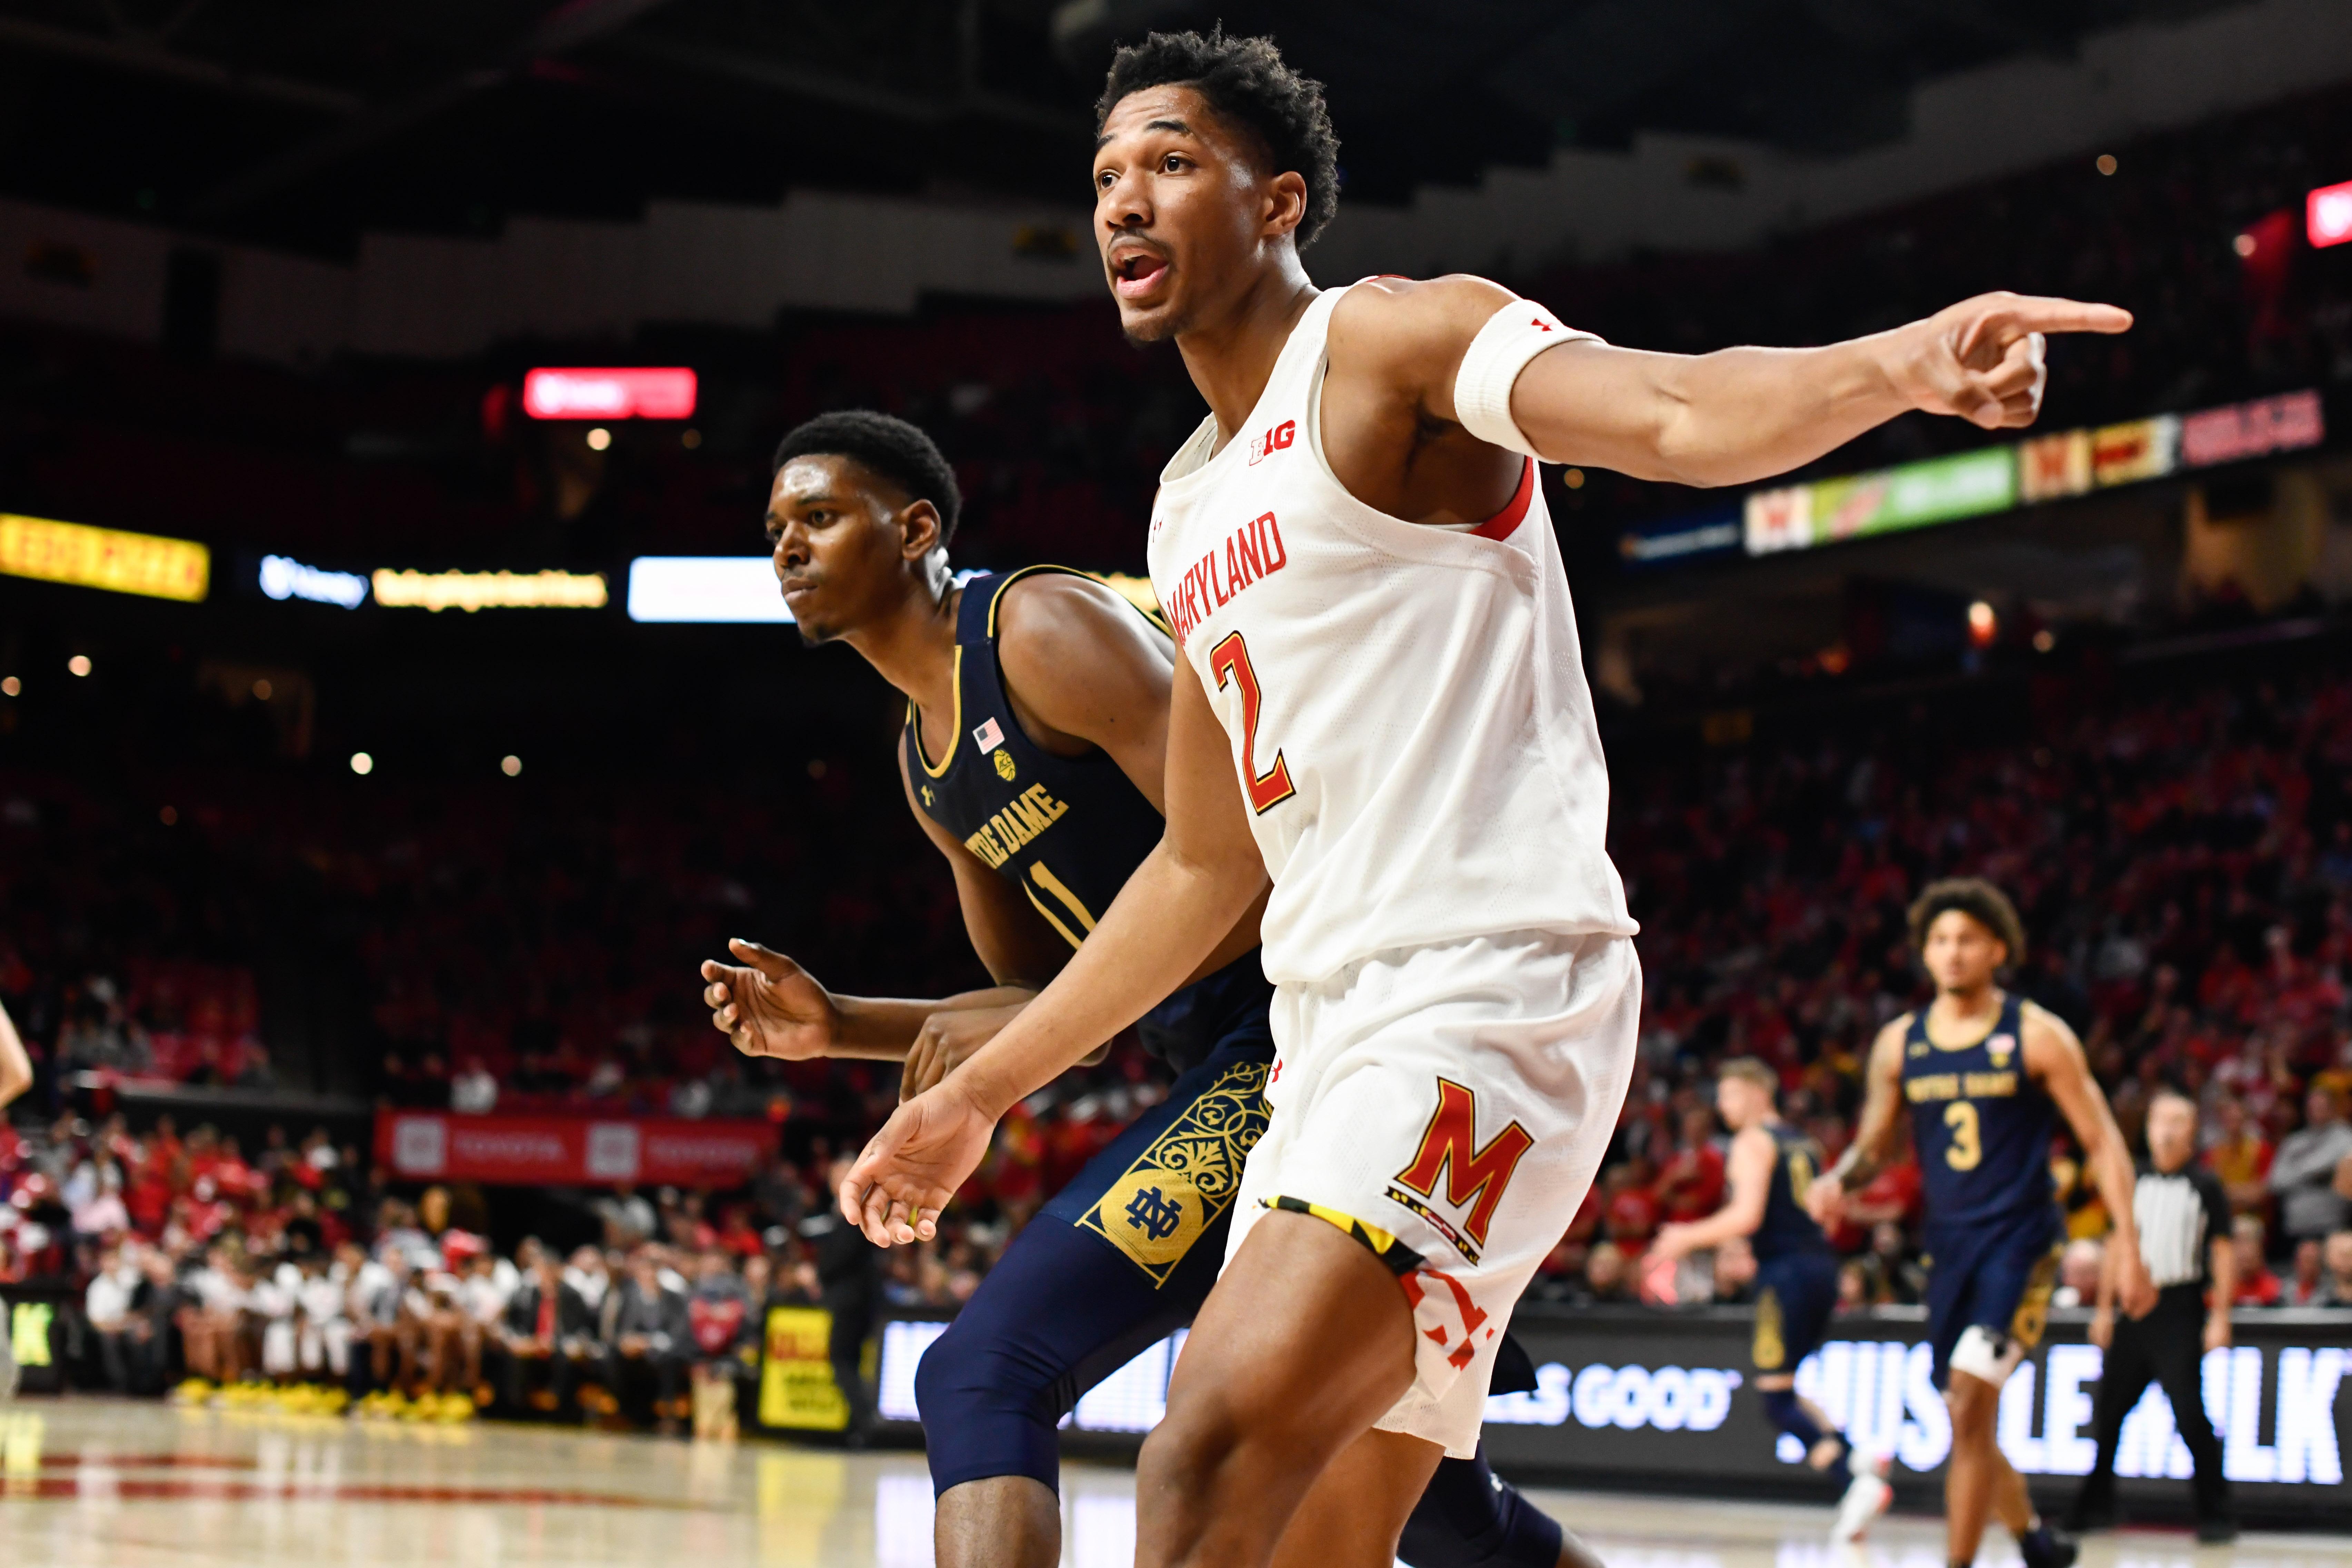 Aaron Wiggins, Notre Dame, Maryland men's basketball